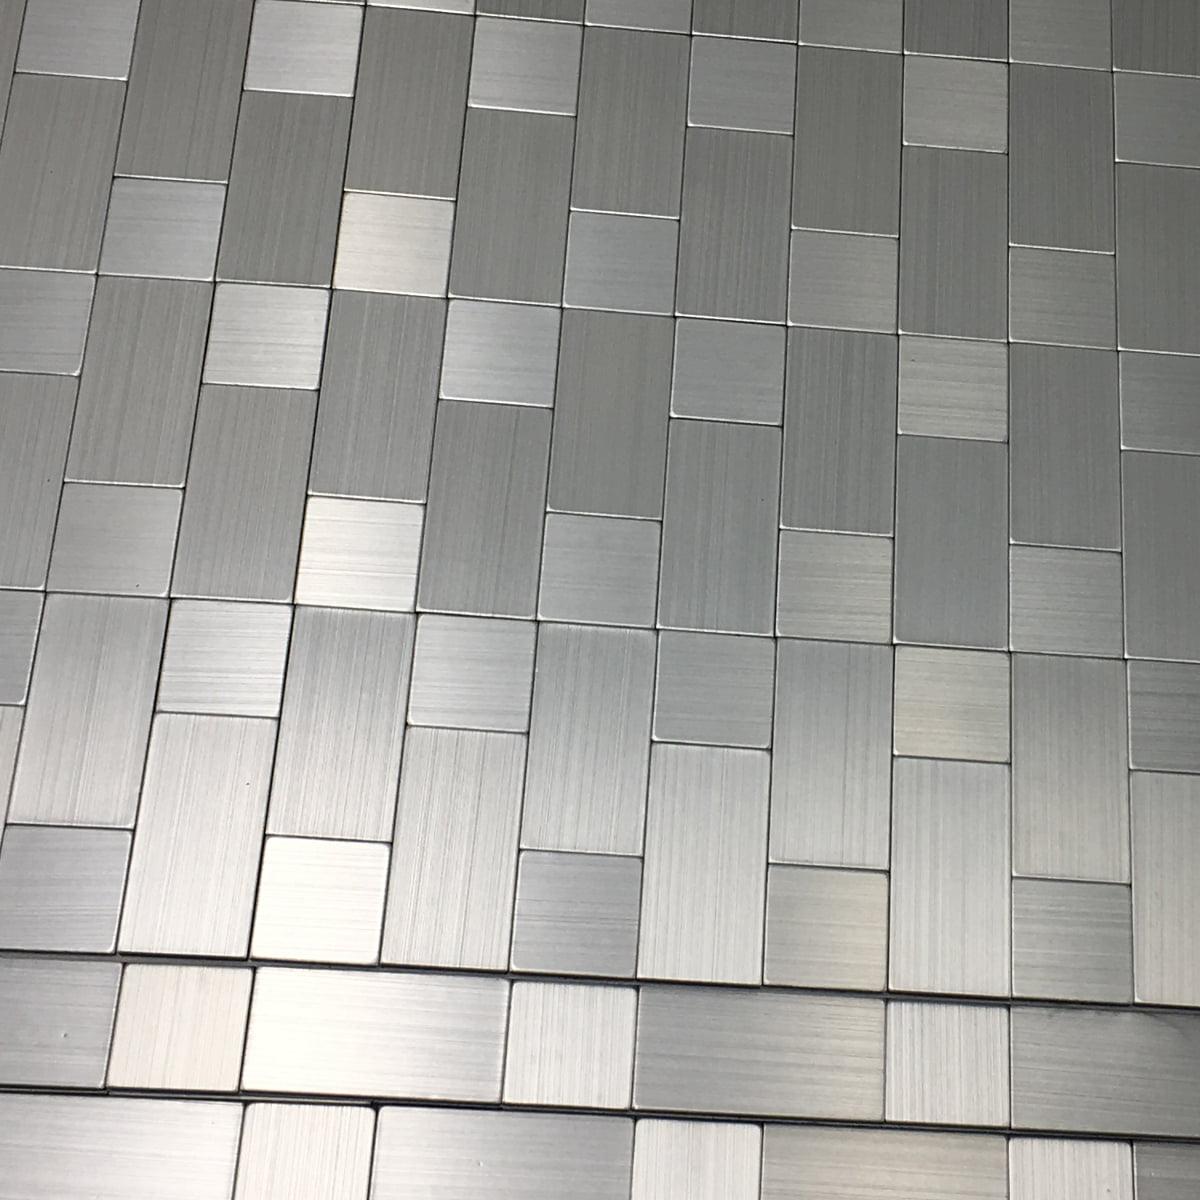 Art3d Aluminium Silver 12 X12 Peel And Stick Backsplash Tile 5 Pack Walmart Com Walmart Com